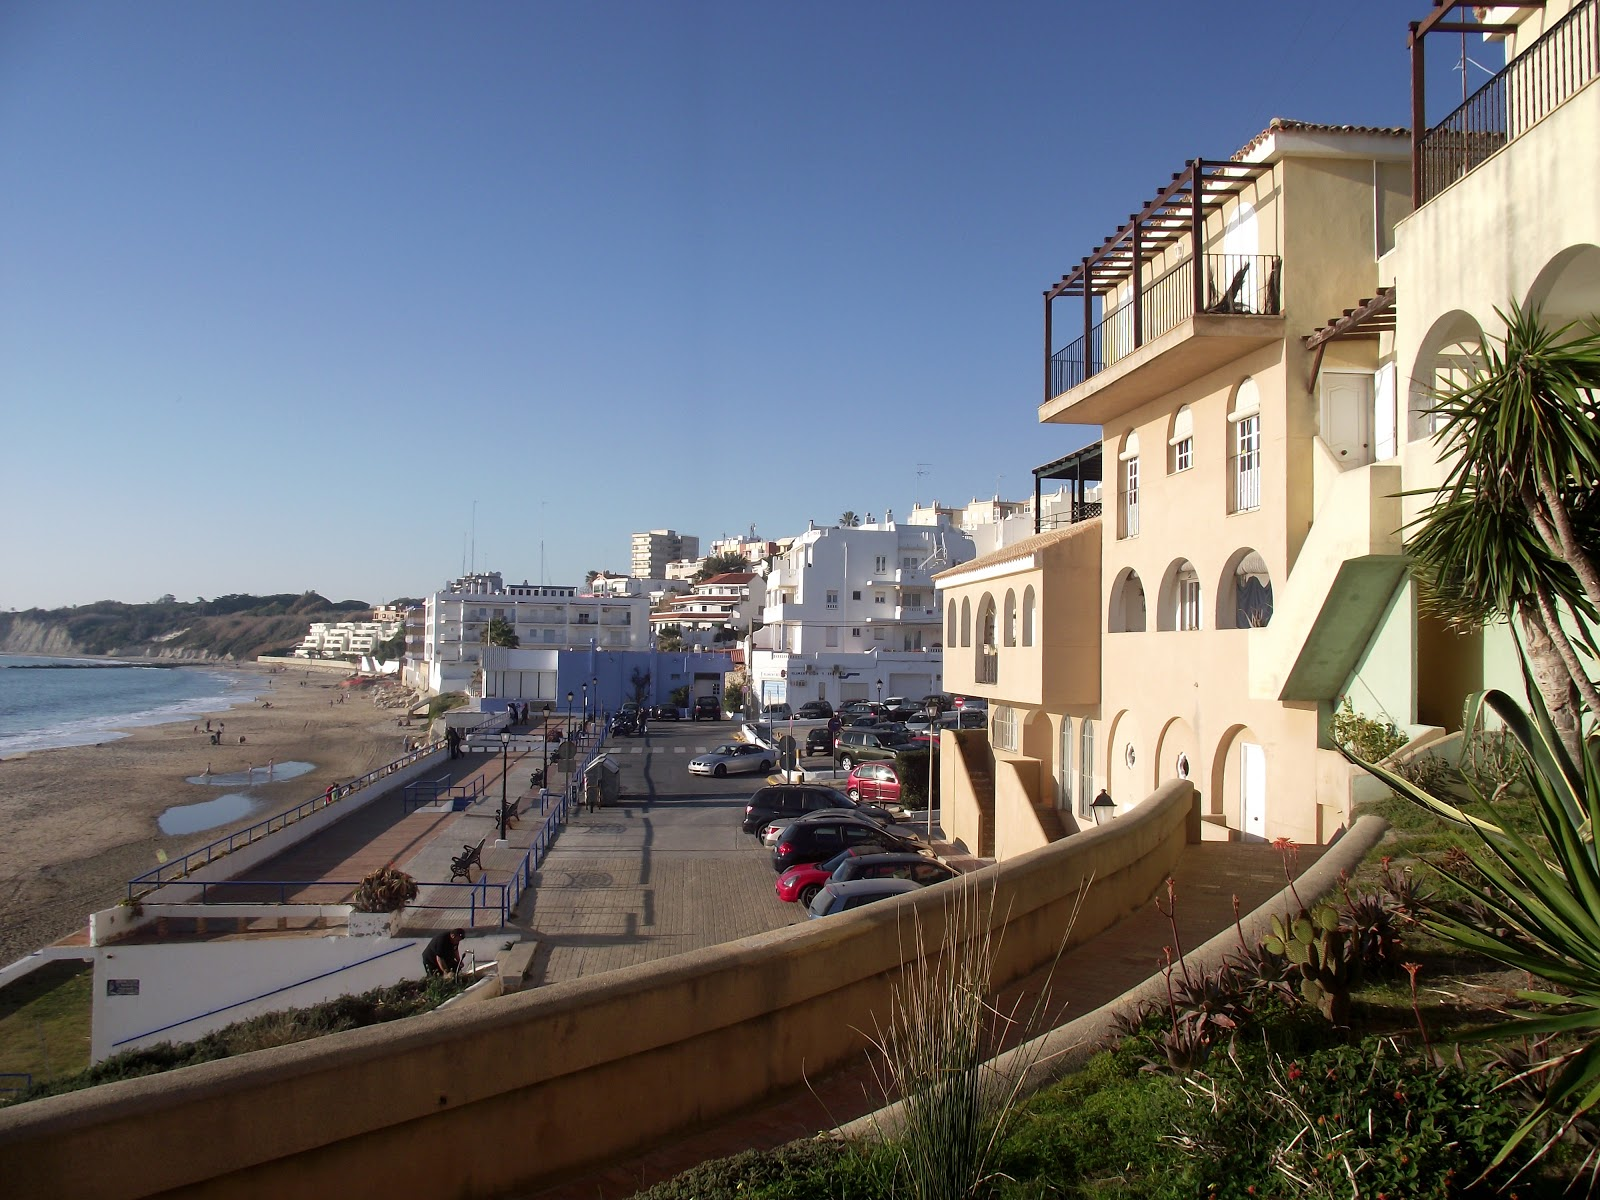 Vivienda pie de ola junto base rota home sale next to beach and the naval station rota - Tren el puerto de santa maria madrid ...